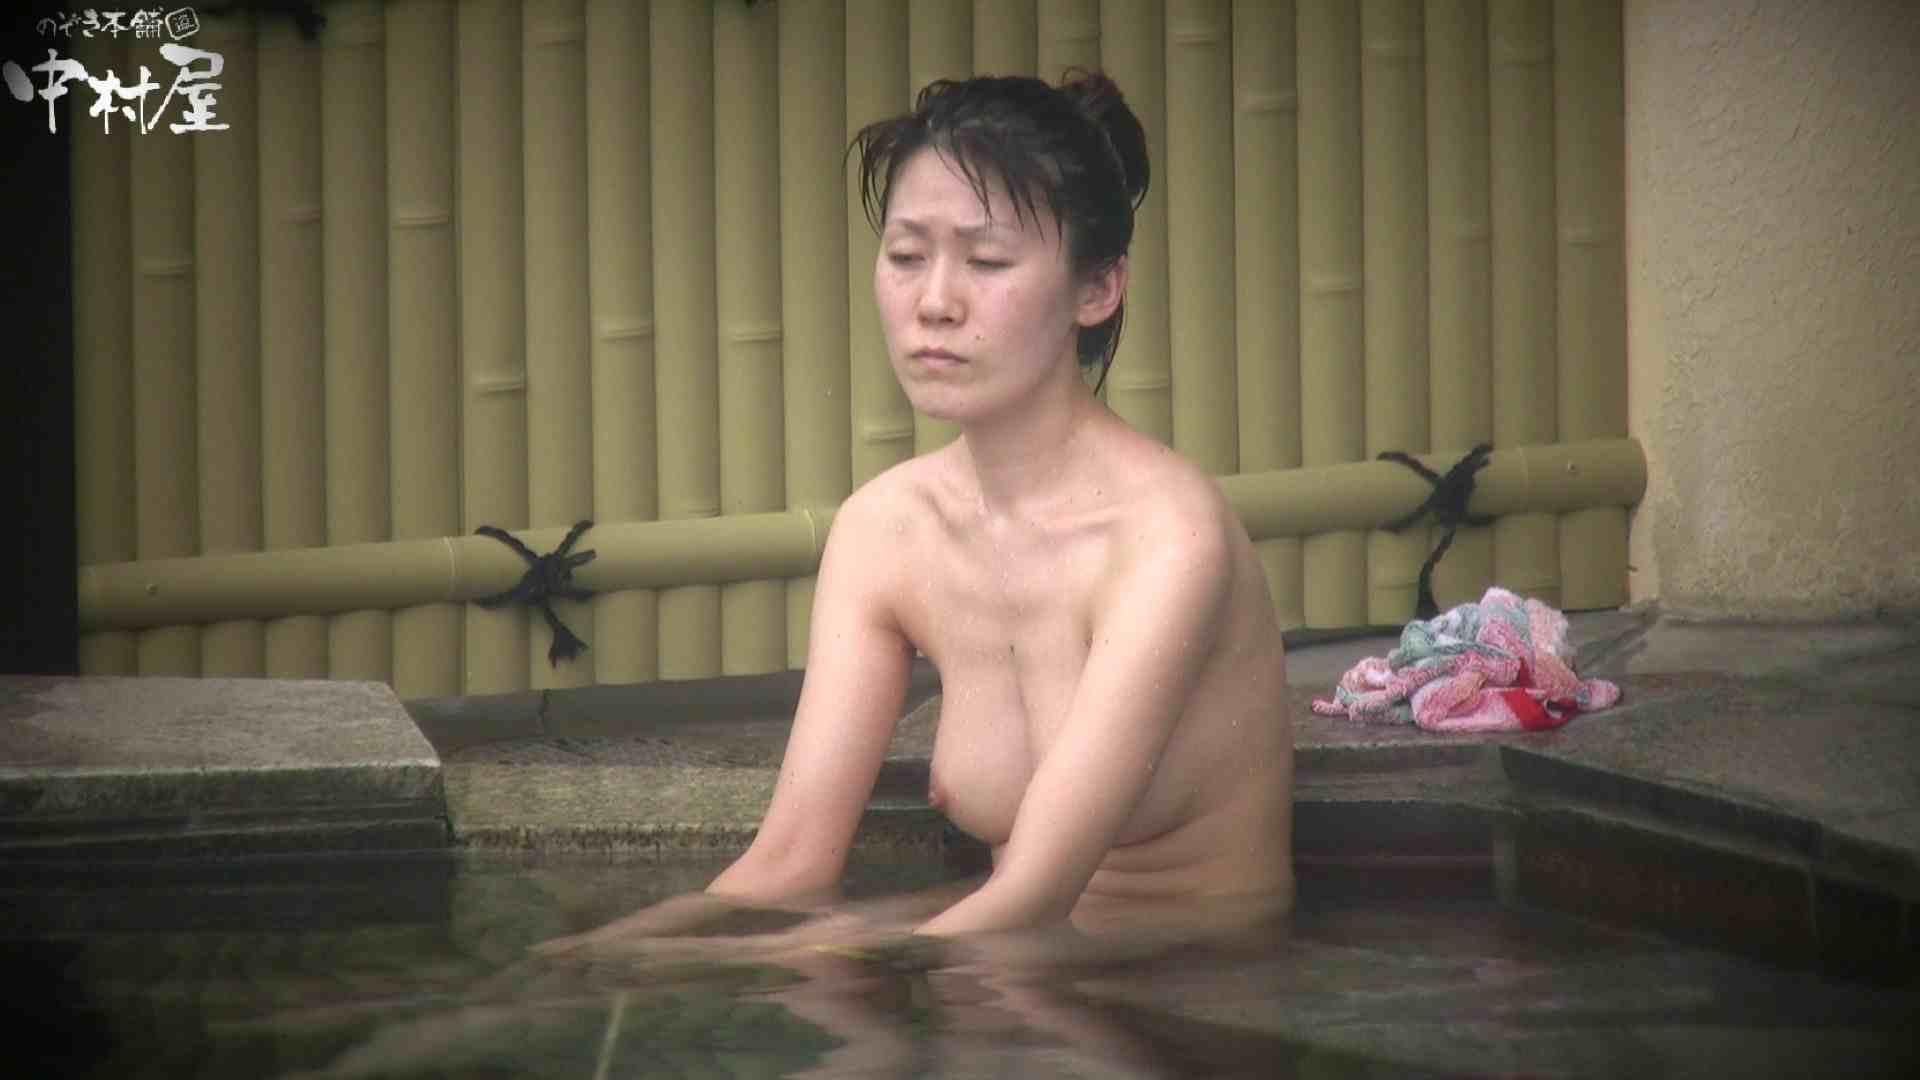 Aquaな露天風呂Vol.896 盗撮映像  81Pix 15